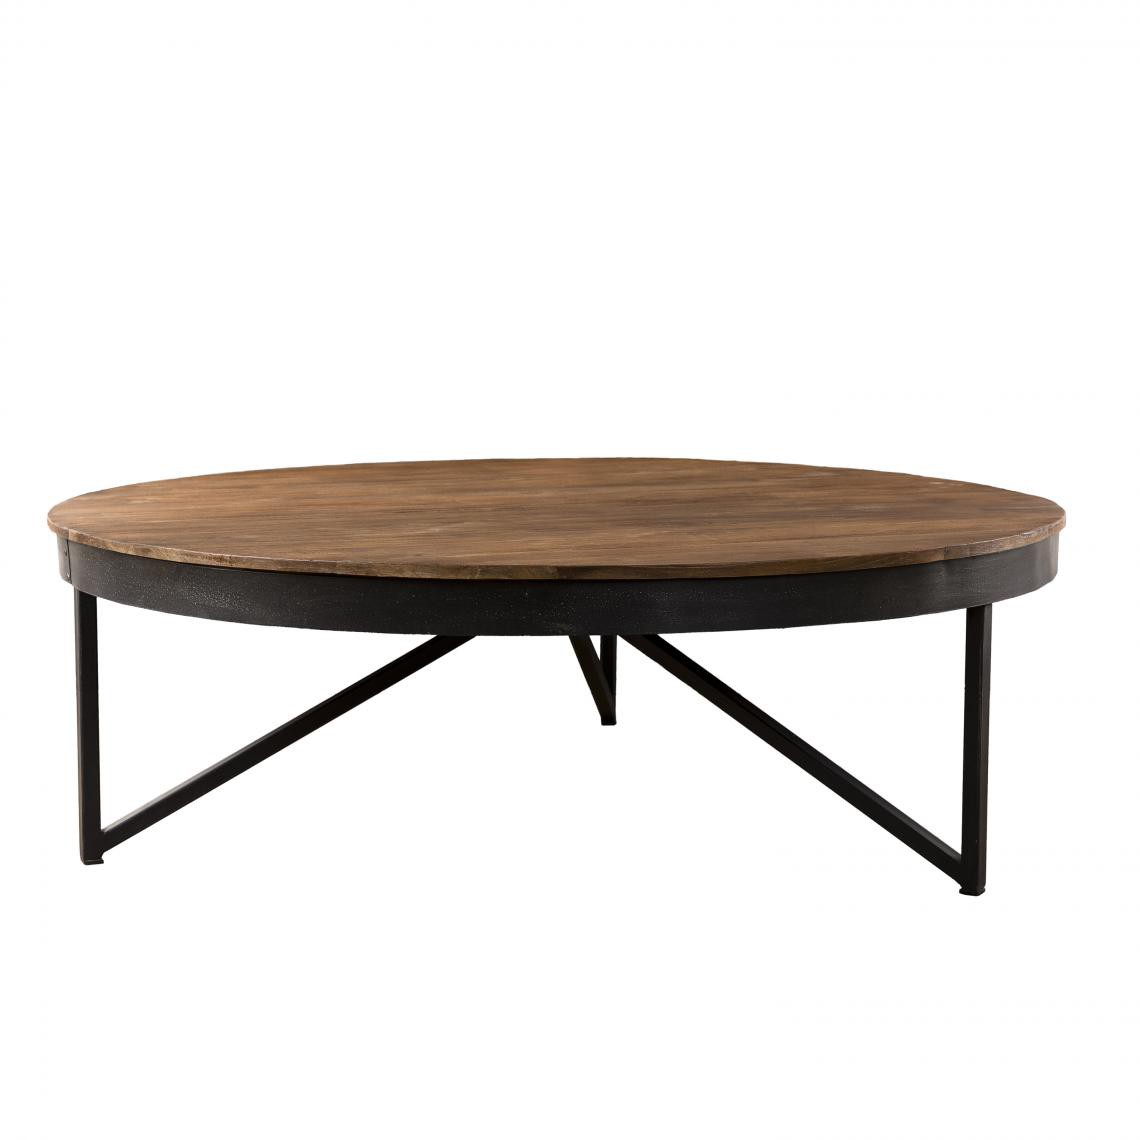 table basse ronde bois de teck recycle pieds metal siana